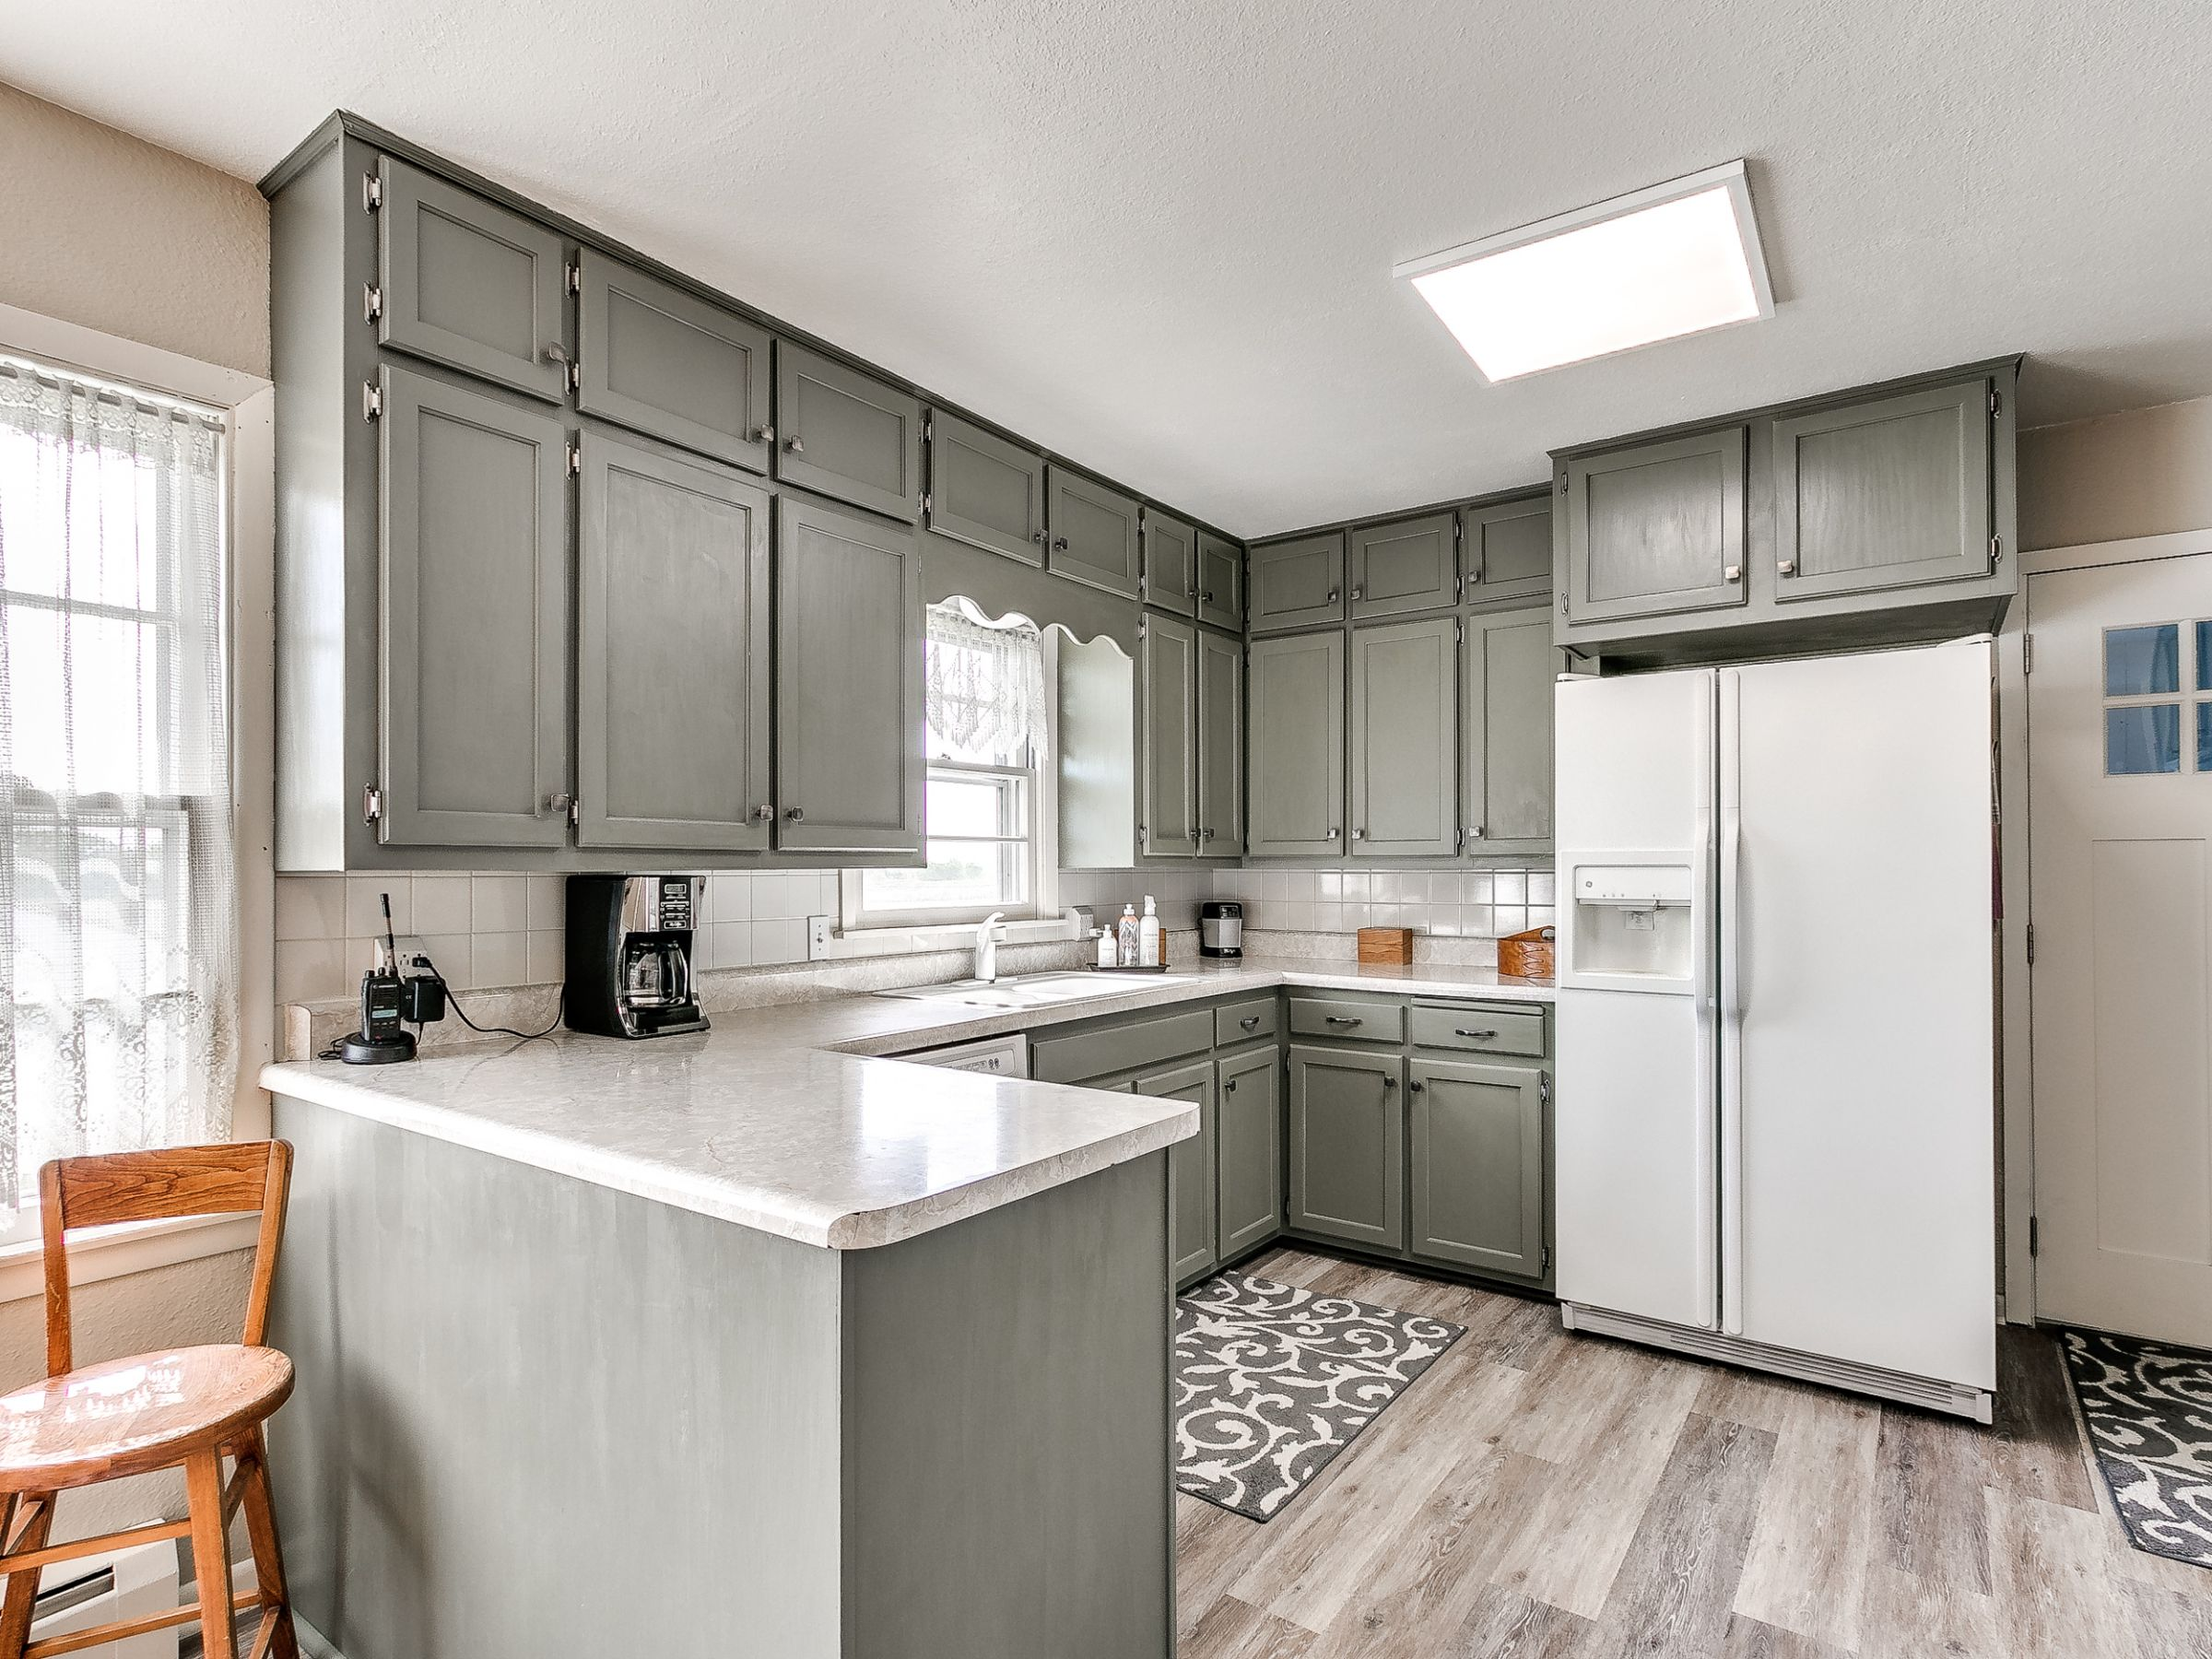 residential-warren-county-iowa-3-acres-listing-number-15516-5-2021-05-12-145109.jpg